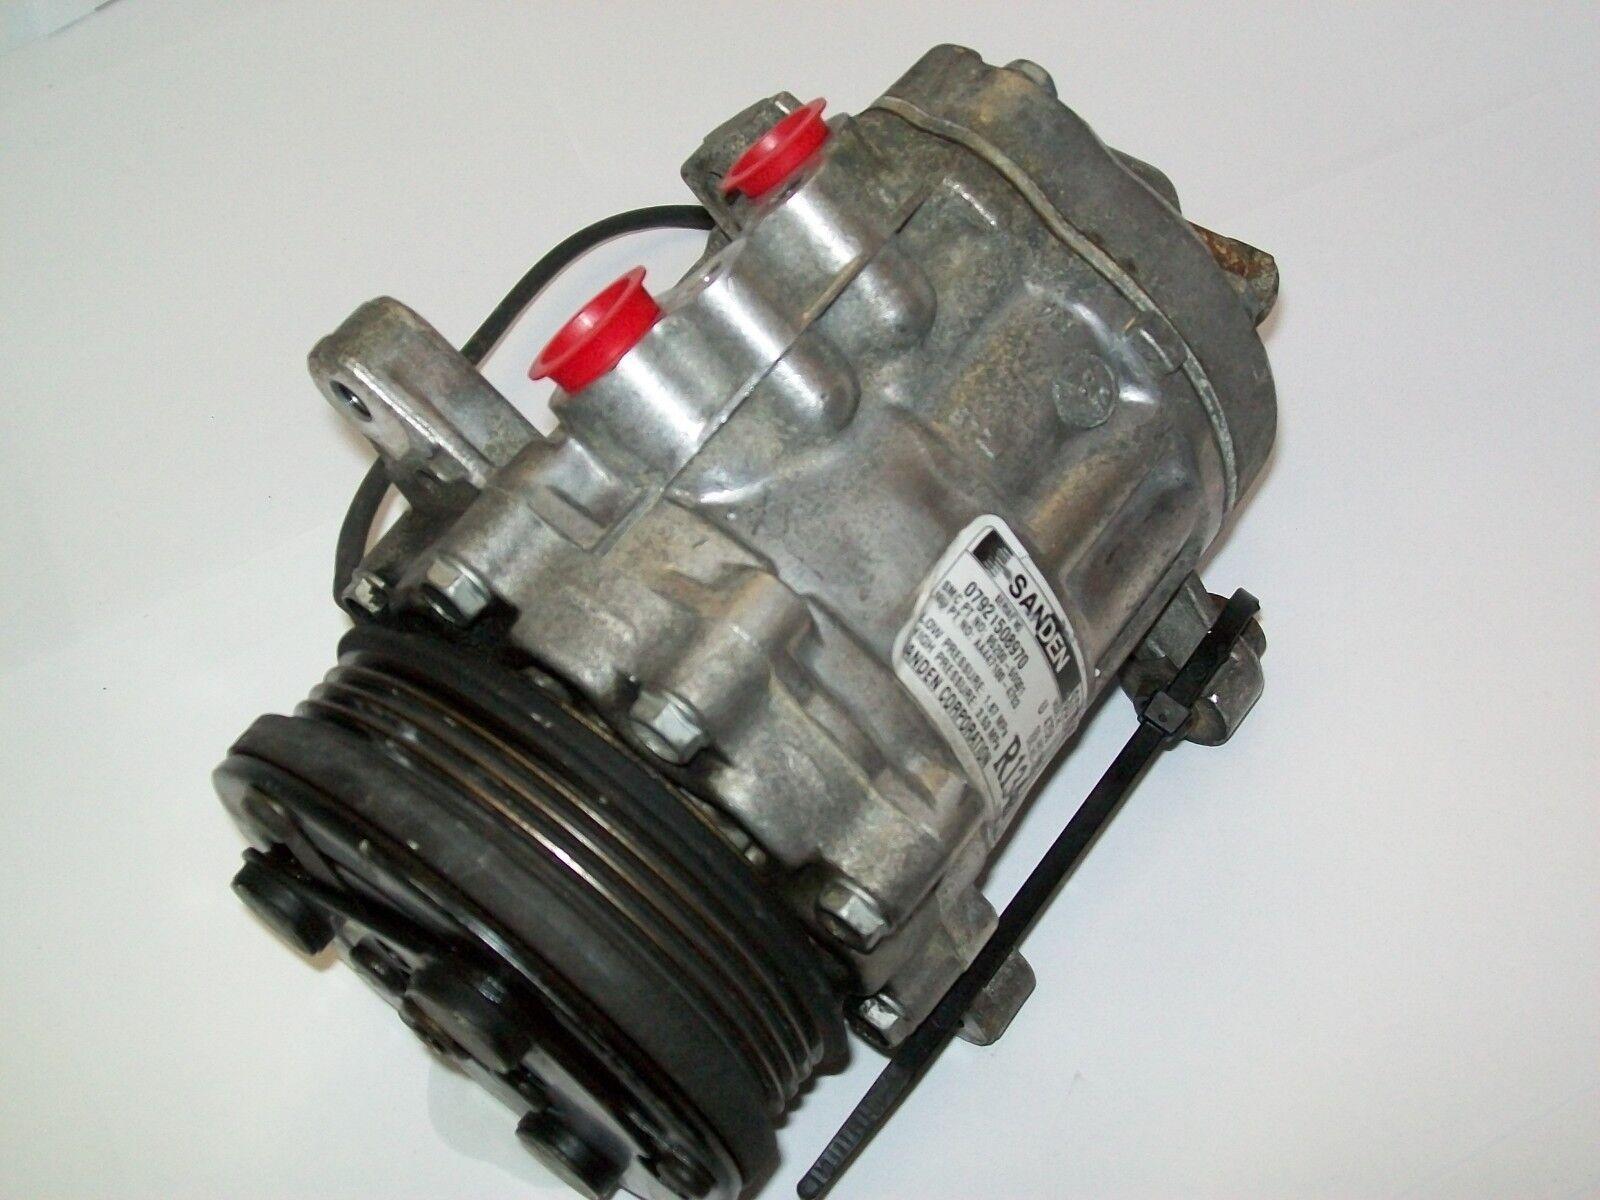 Used Suzuki Swift A C Compressors And Clutches For Sale Fuel Pump 1995 2001 Compressor All Chevrolet Geo Metro Ac 67573 4622 Oe